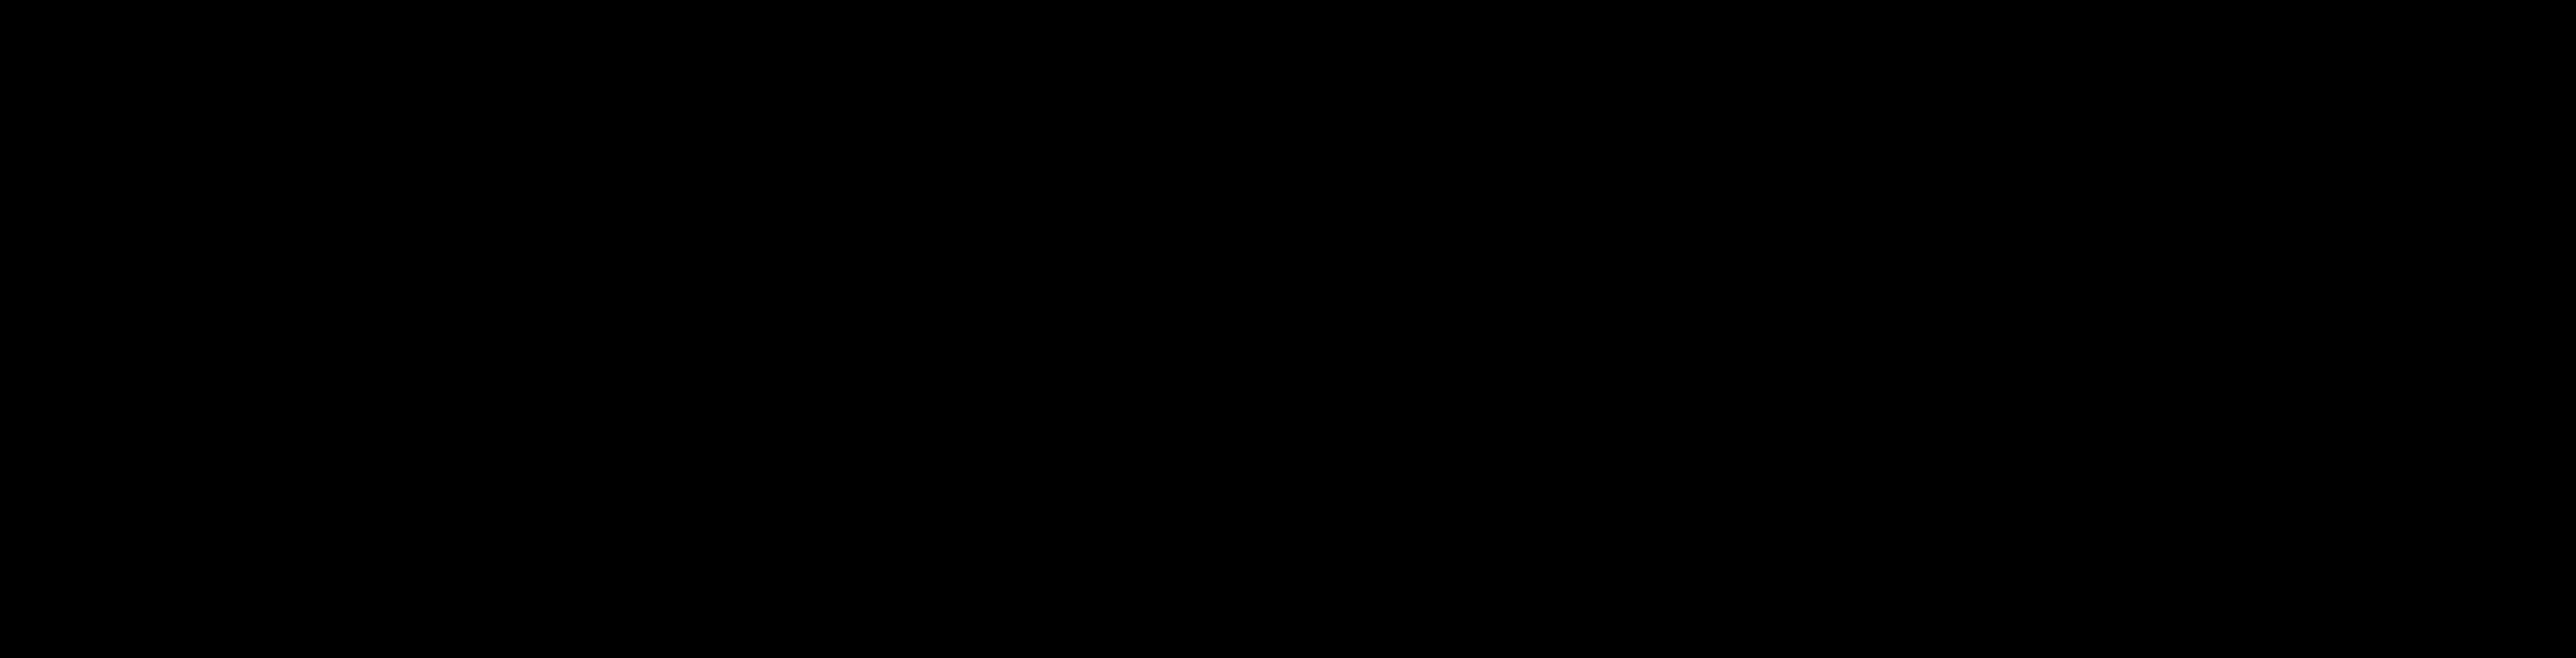 Variant – Commercial Trailer – 3525 P4 (560x250x95 cm)